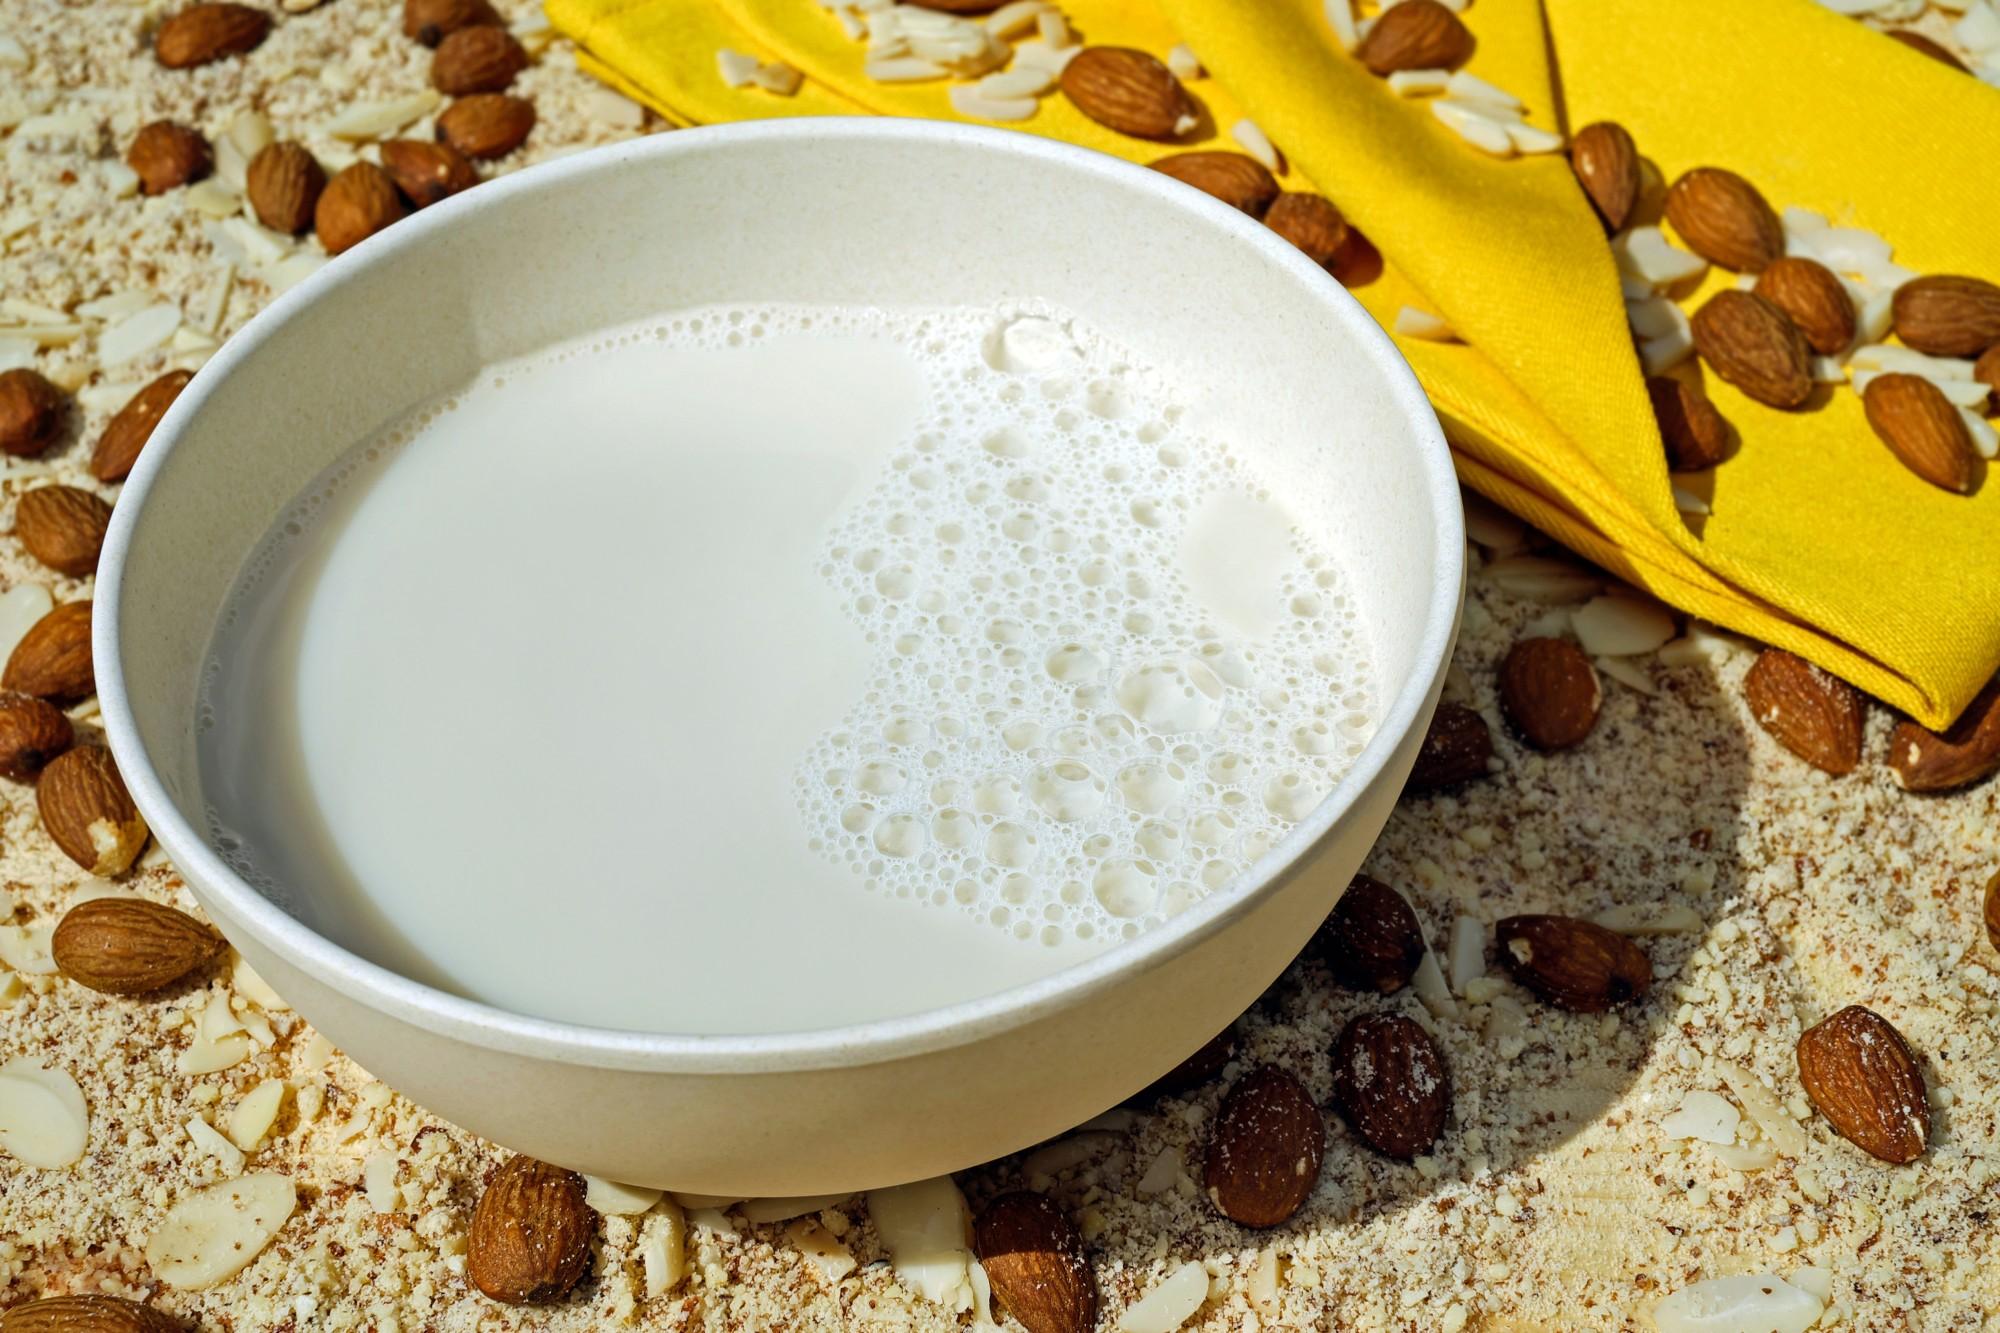 No Dairy, No Problem! 3 Best Vegan Milk Alternatives